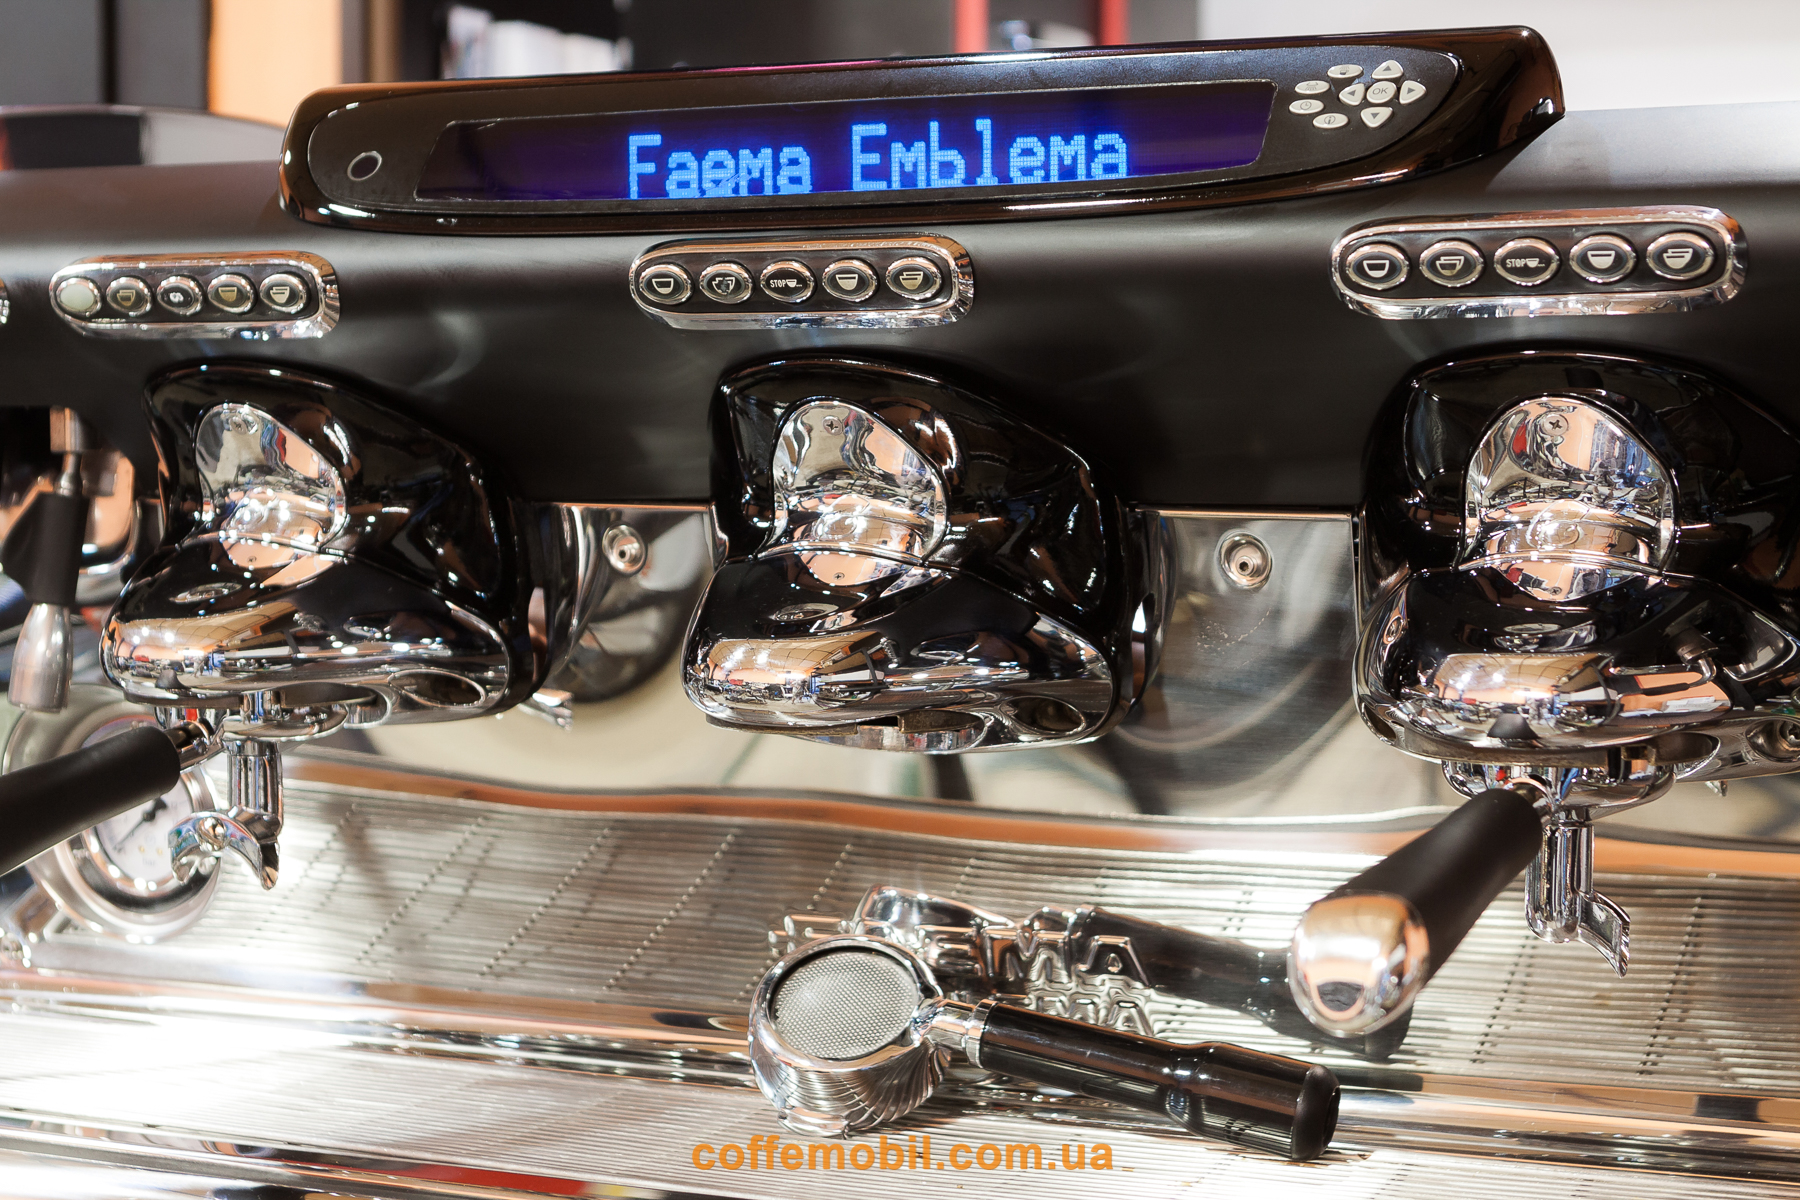 faema emblema 3gr black edition